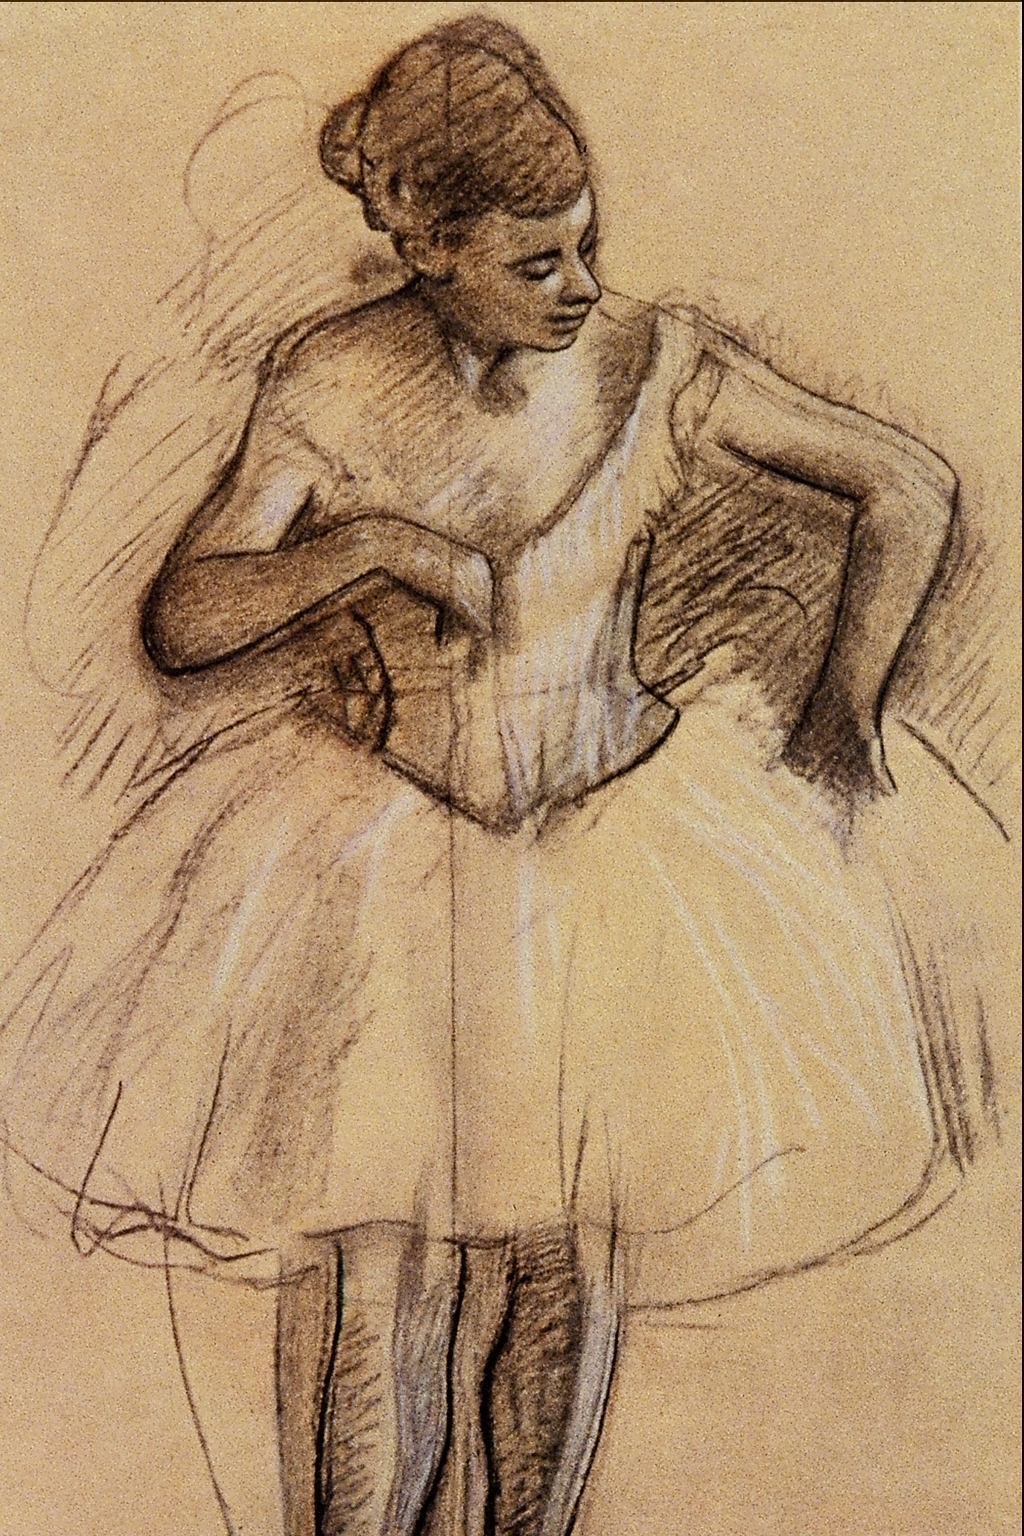 Ballet_Dancer_-_Edgar_Degas.png (1024×1536)